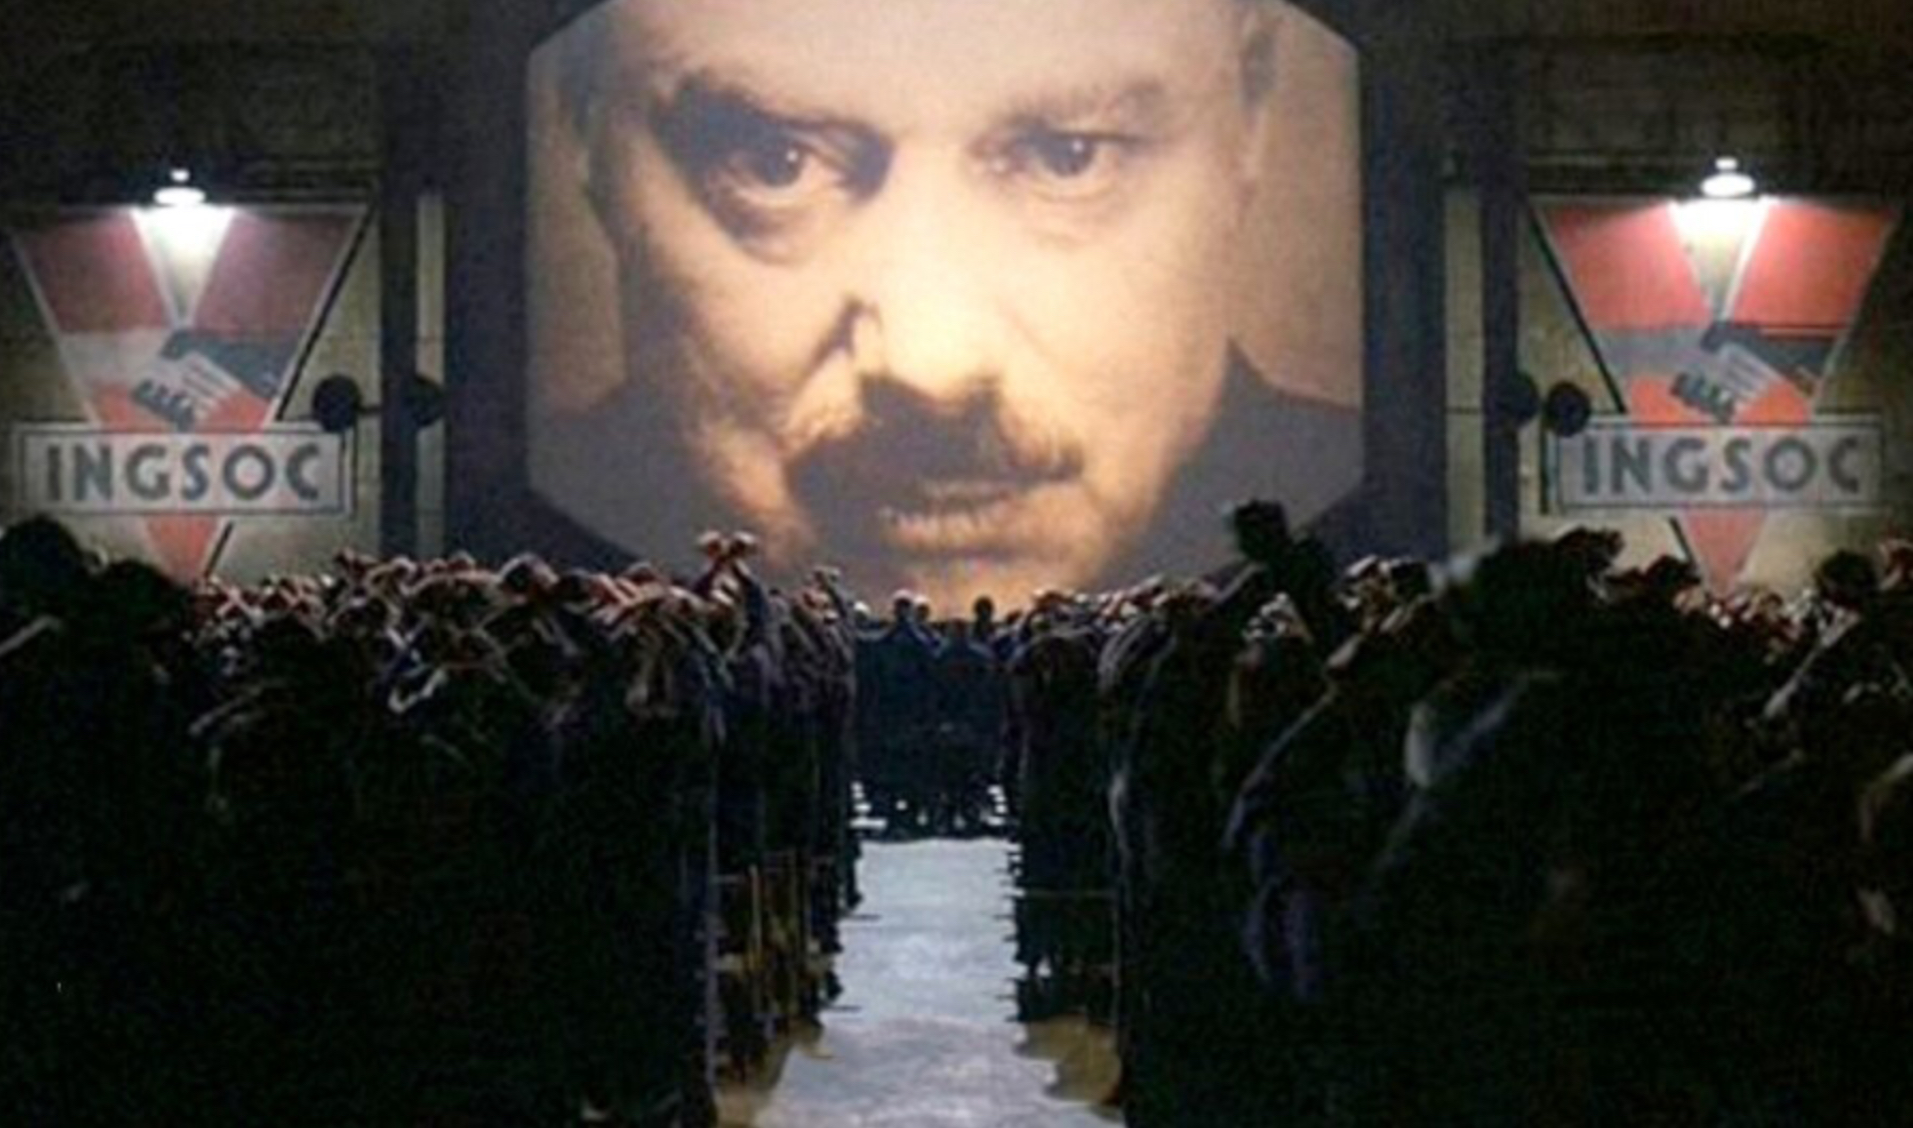 O Ασάνζ, ο Σνόουντεν, η(ο) Μάνινγκ, ο πόλεμος της πληροφορίας και ο …Λένιν